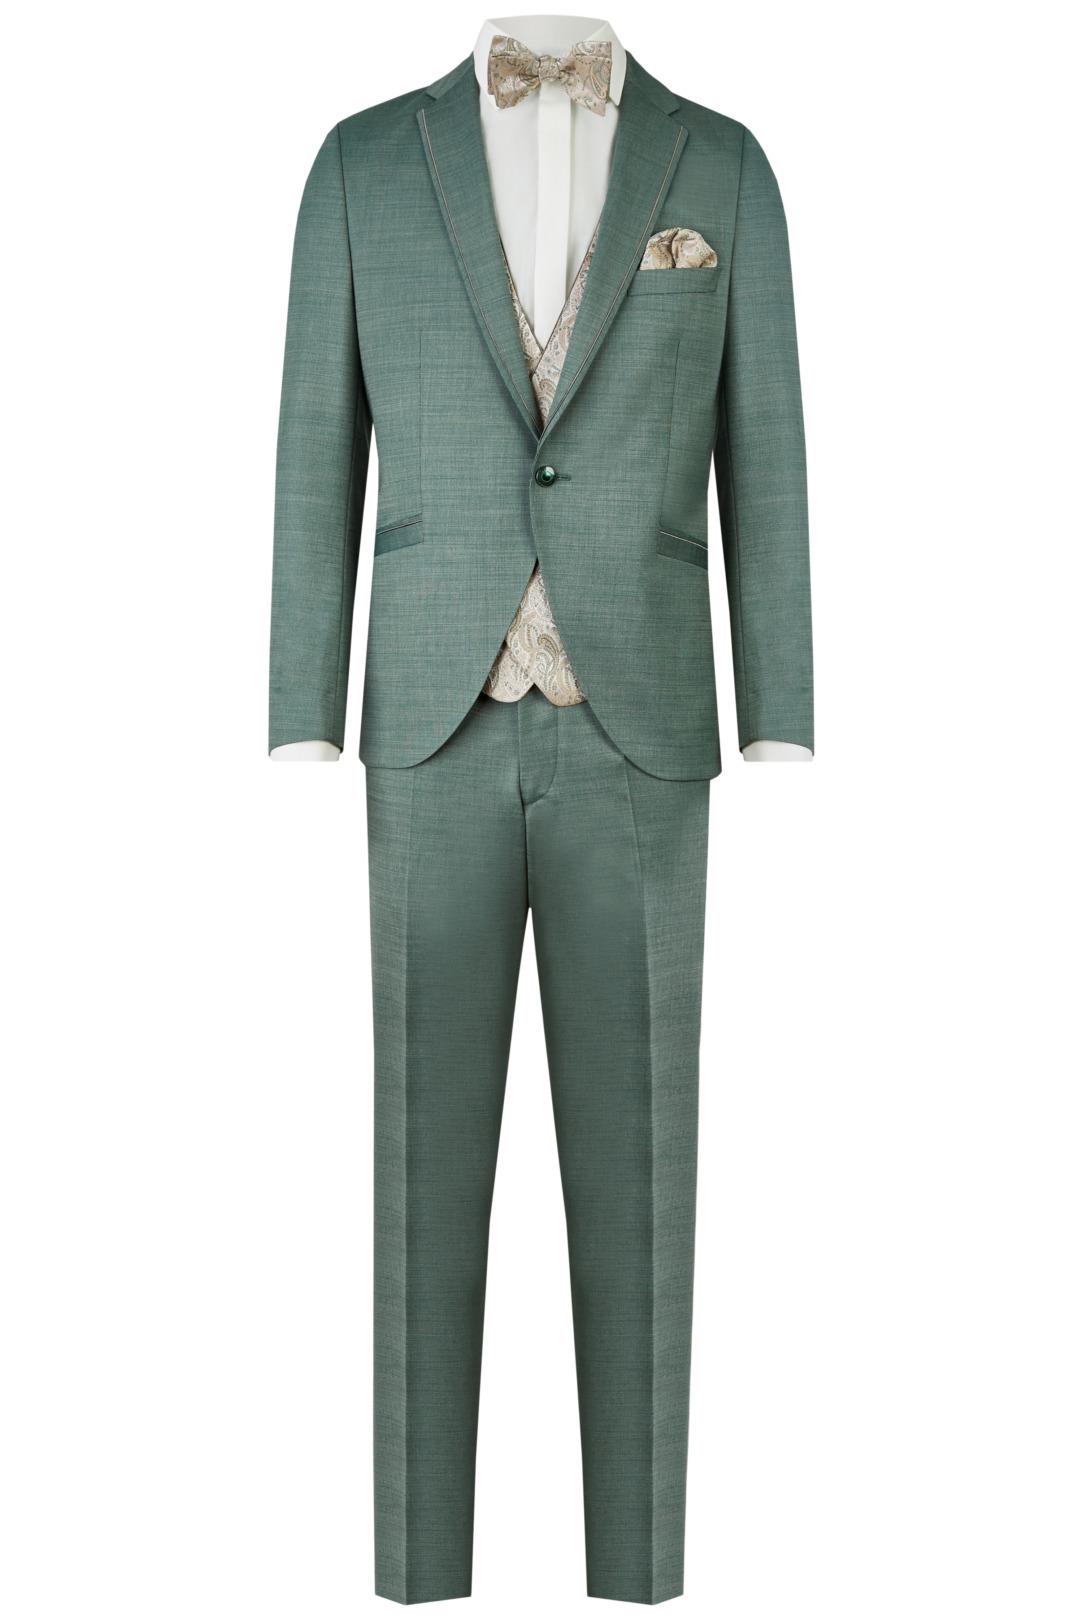 Wilvorst After Six Hochzeitsanzug Männer Mode Bräutigam klassische Form grün petrol wil_0121_otf_as-look-4_1